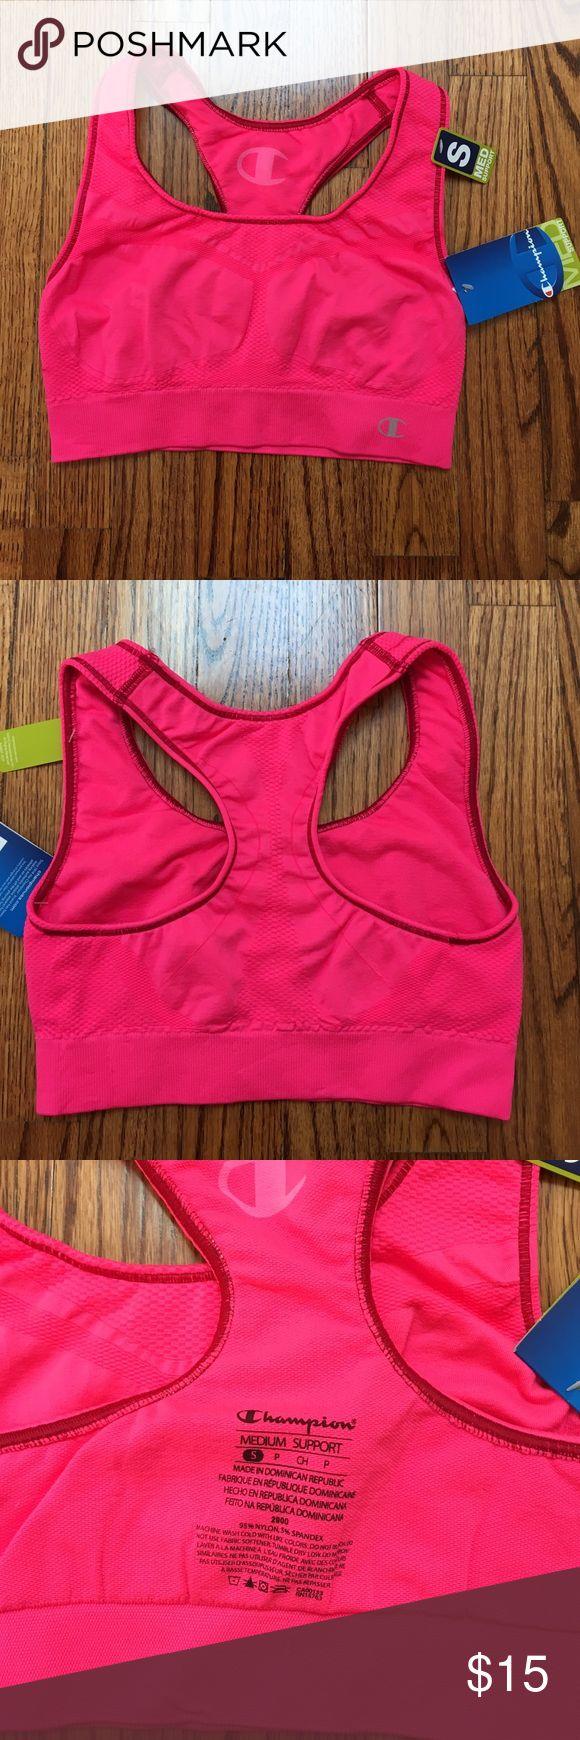 Brand new Champion sports bra Hot pink medium support sports bra. Size small brand new Intimates & Sleepwear Bras